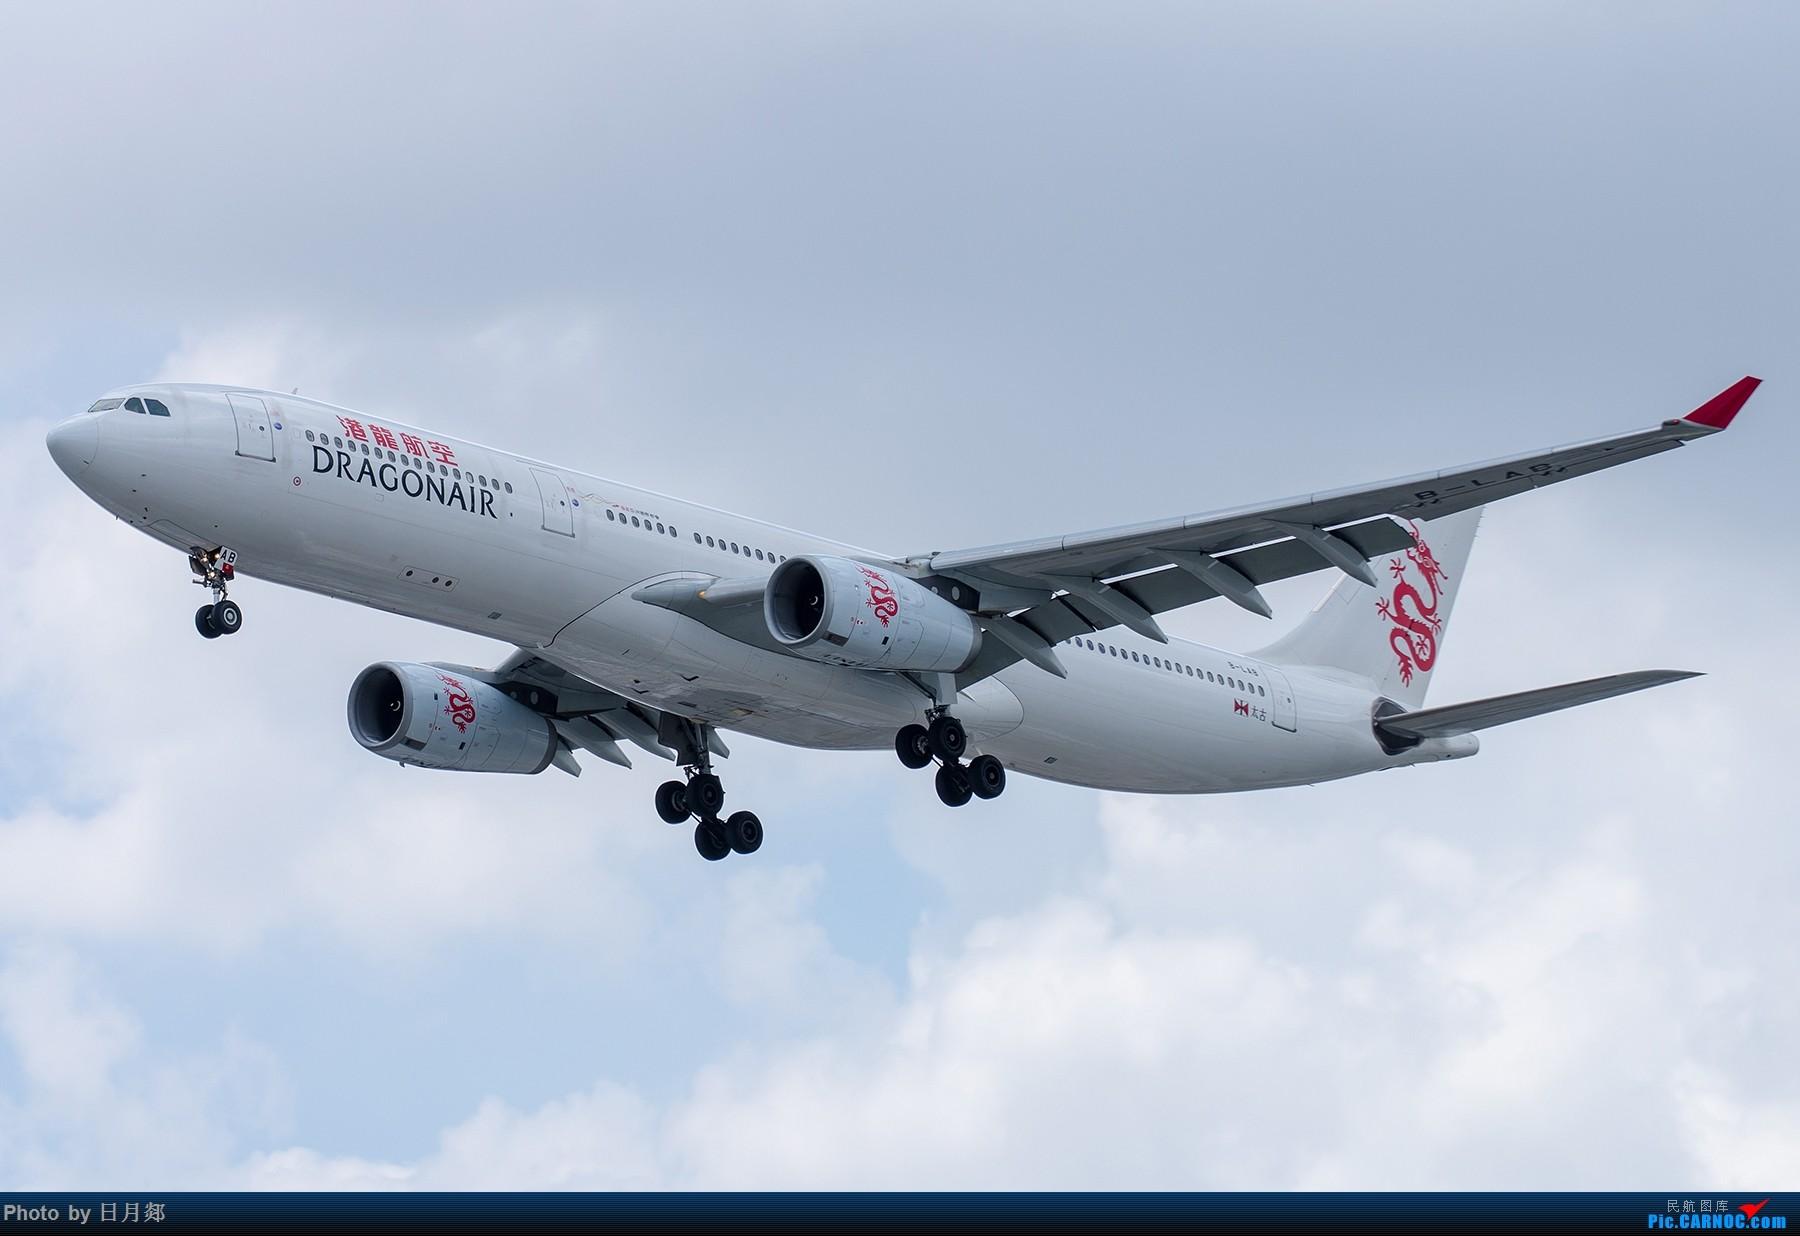 Re:[原创]【SHA拍机*1800大图】图要抓紧发,不然就要炒冷饭,大头镇贴 AIRBUS A330-300 B-LAB 中国上海虹桥国际机场